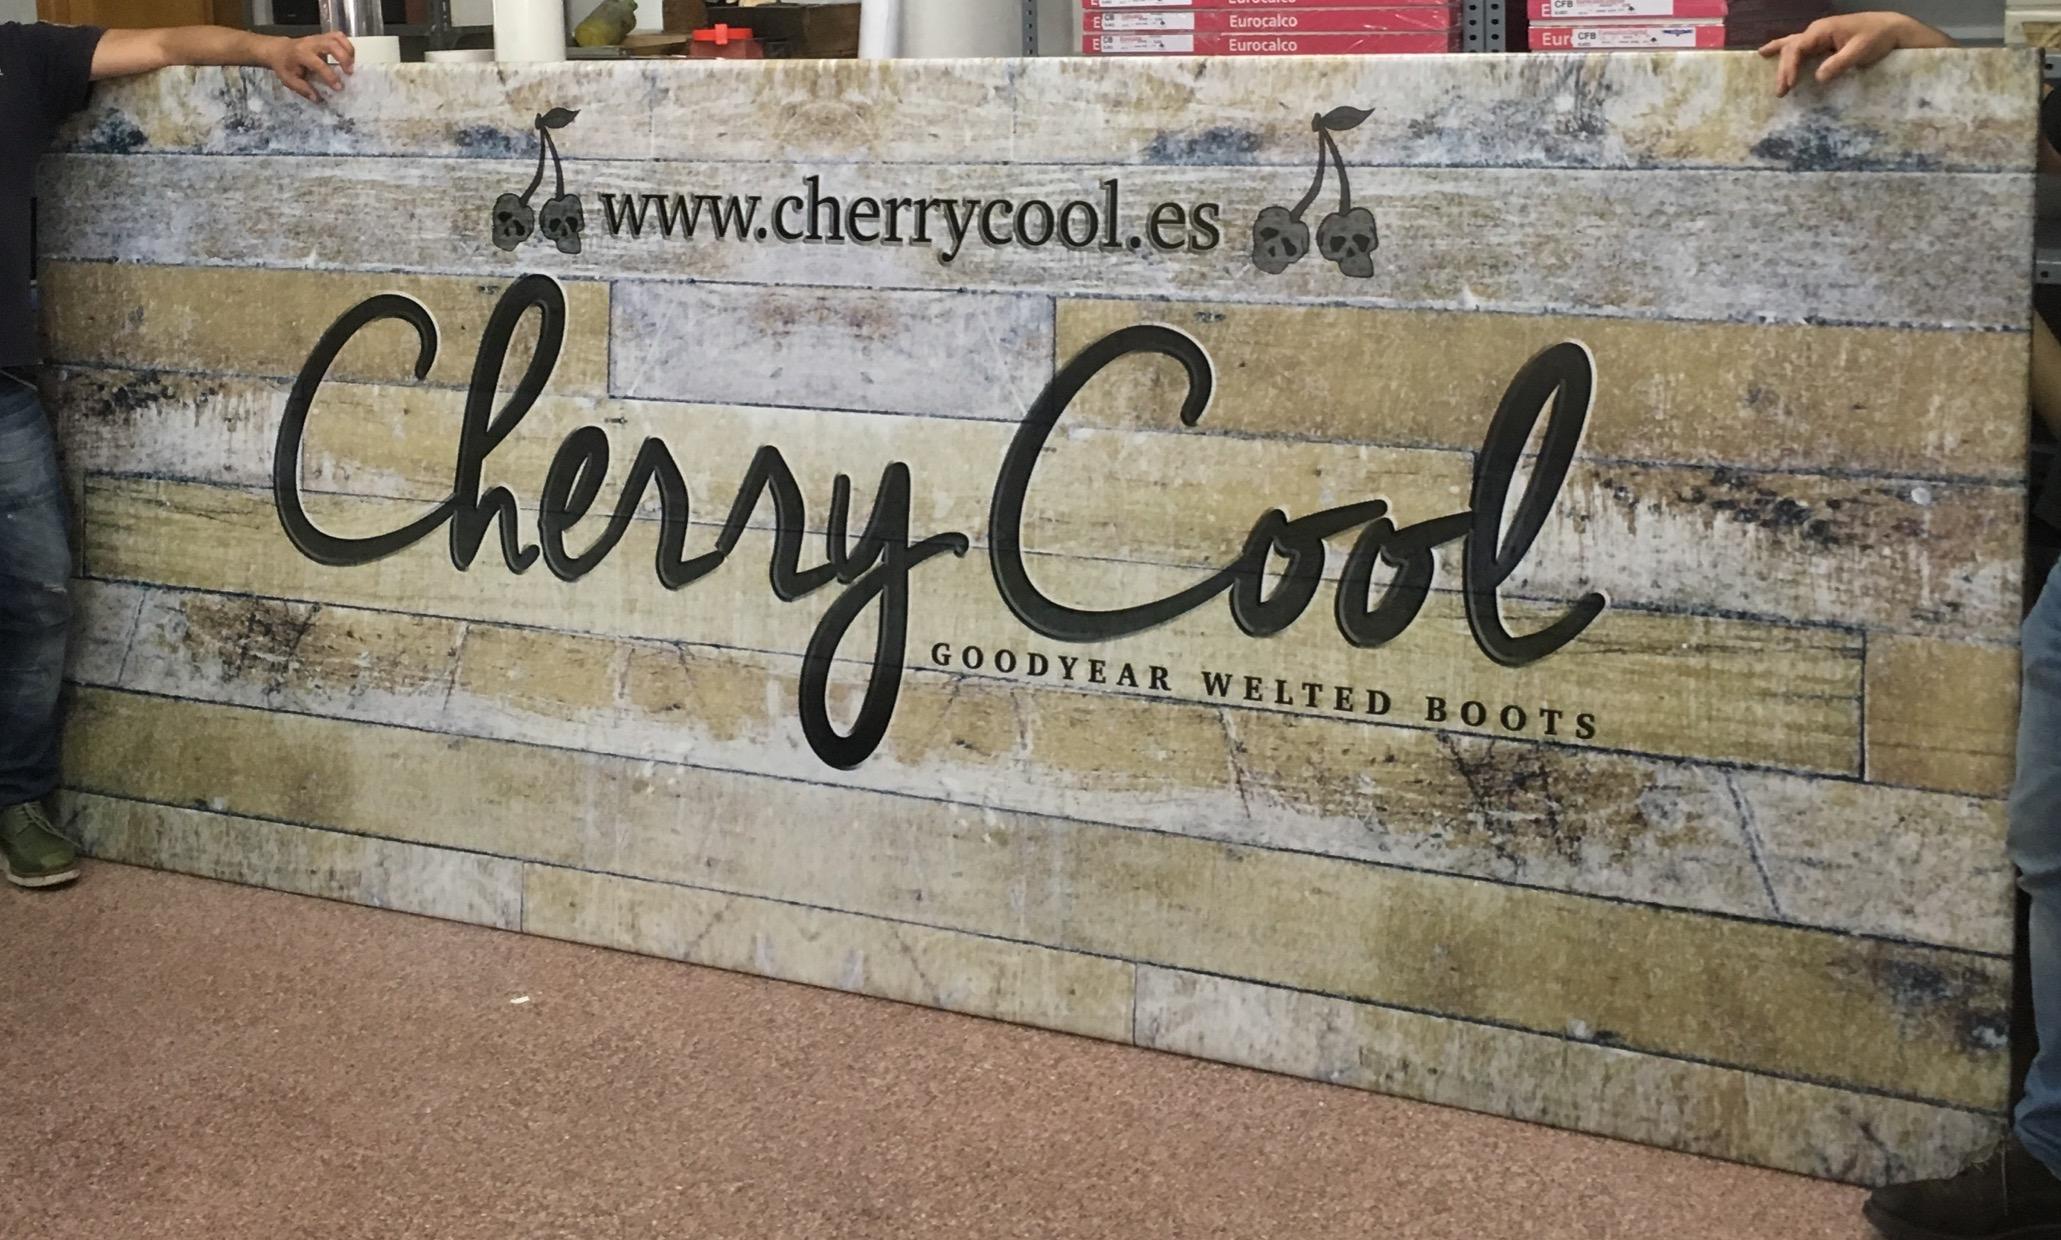 CHERRY COOL